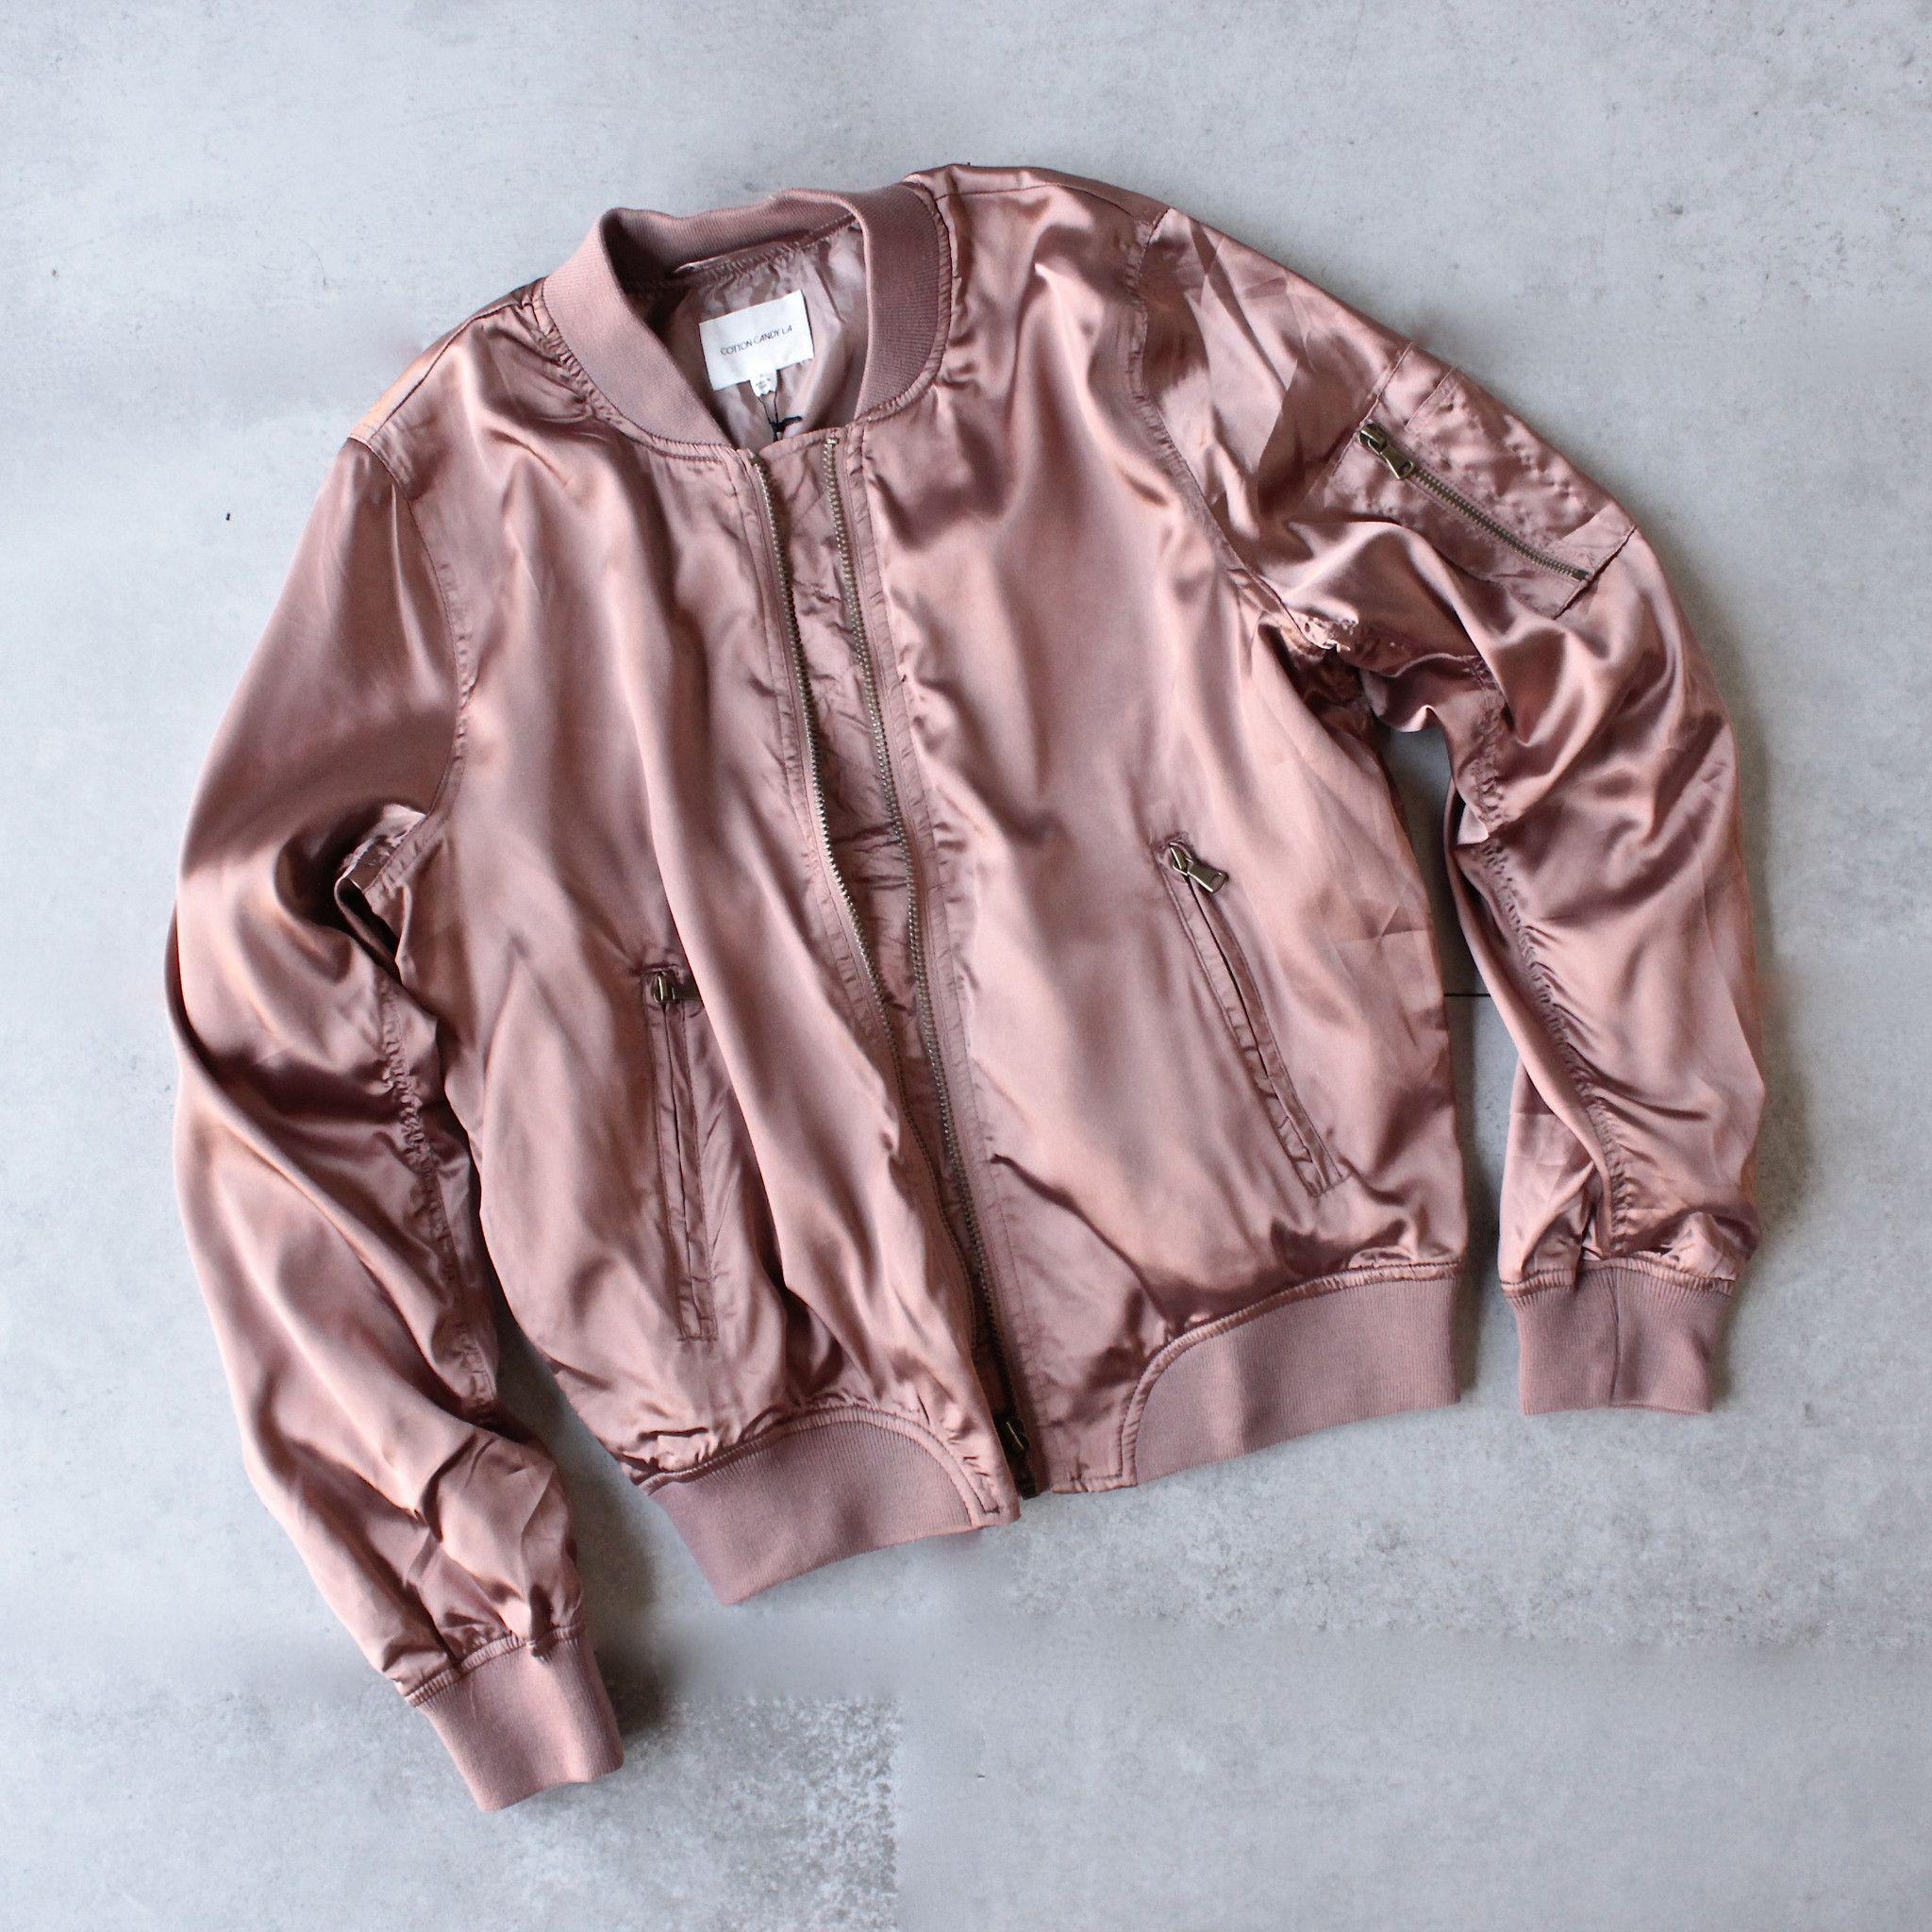 Leather jacket with roses - Lightweight Satin Bomber Jacket Rose Gold